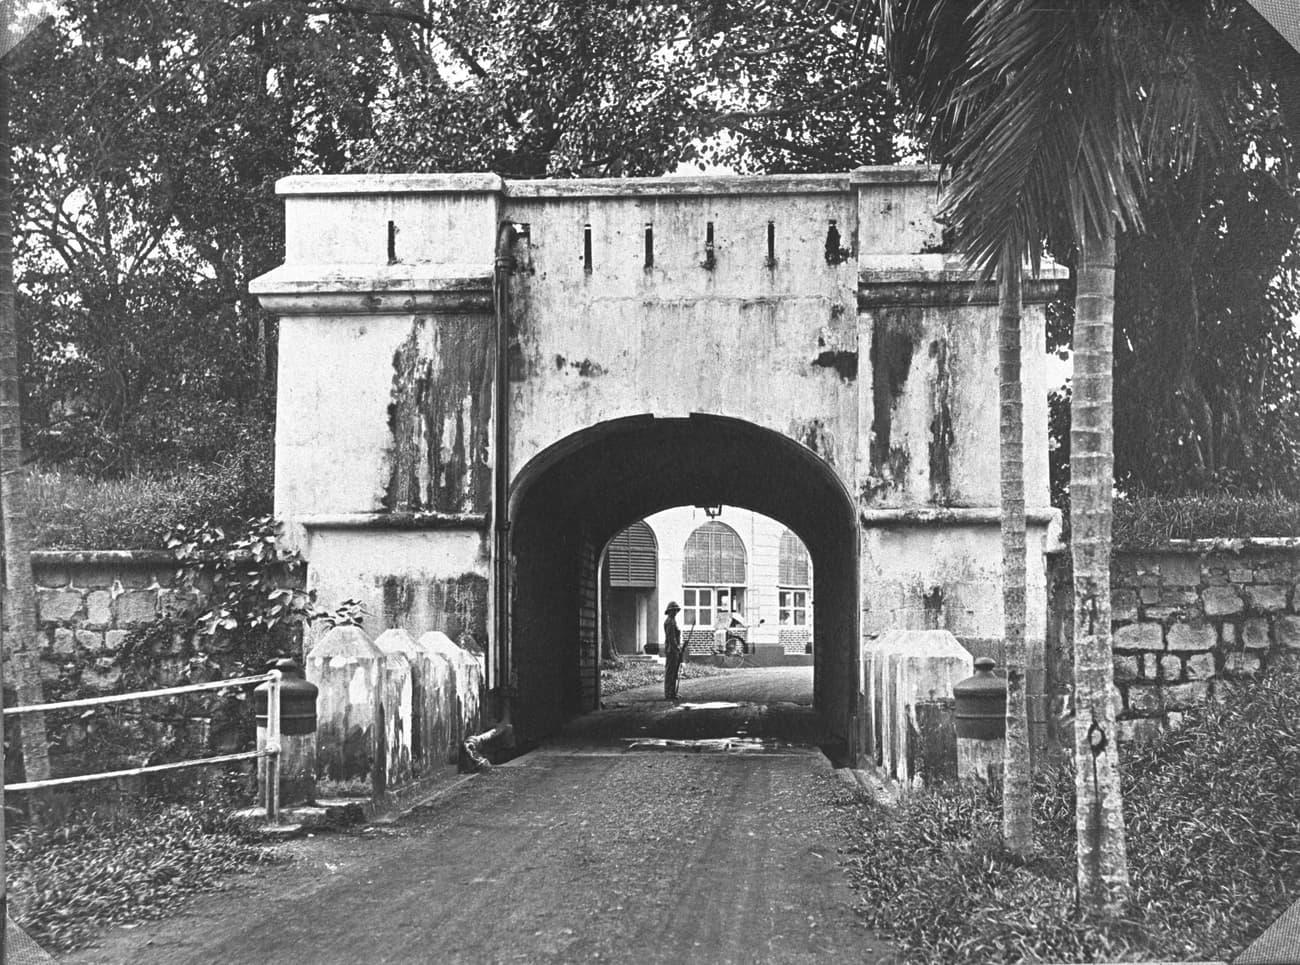 Fort Canning Entrance, 1925